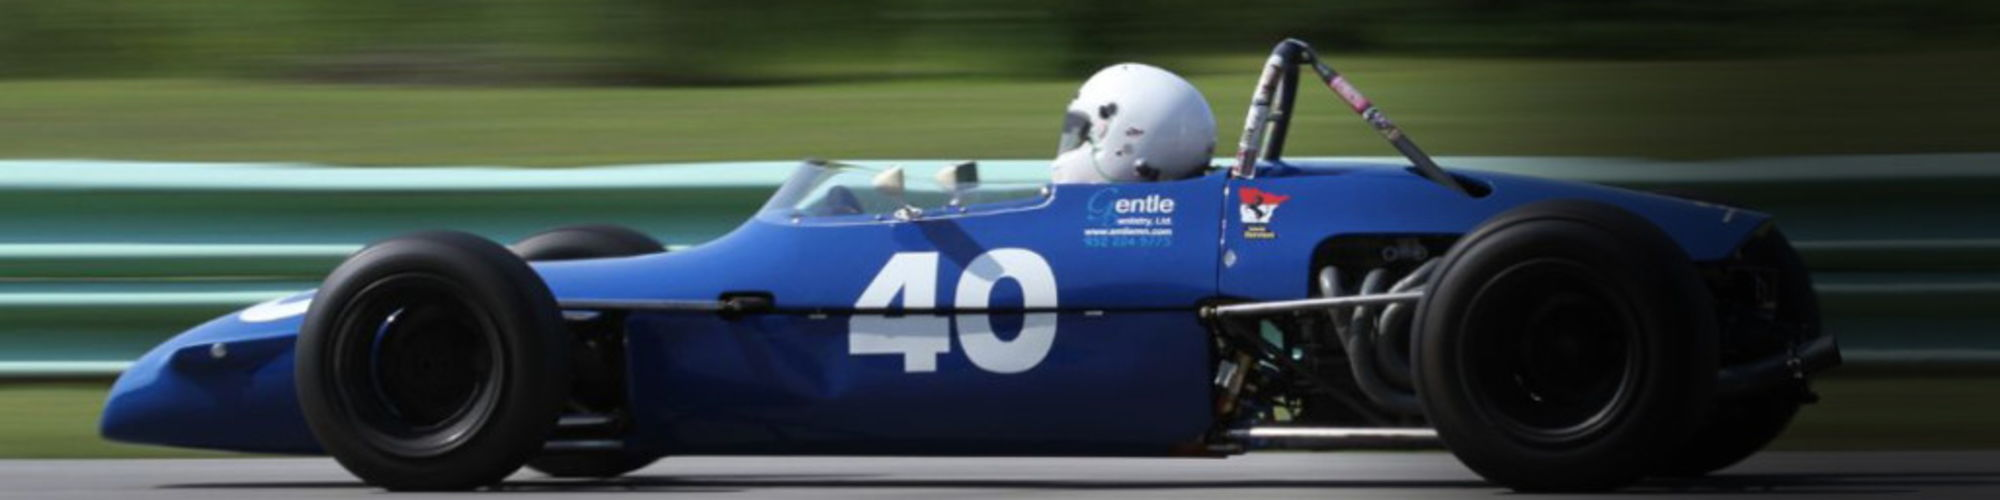 Donnybrooke Motorsports